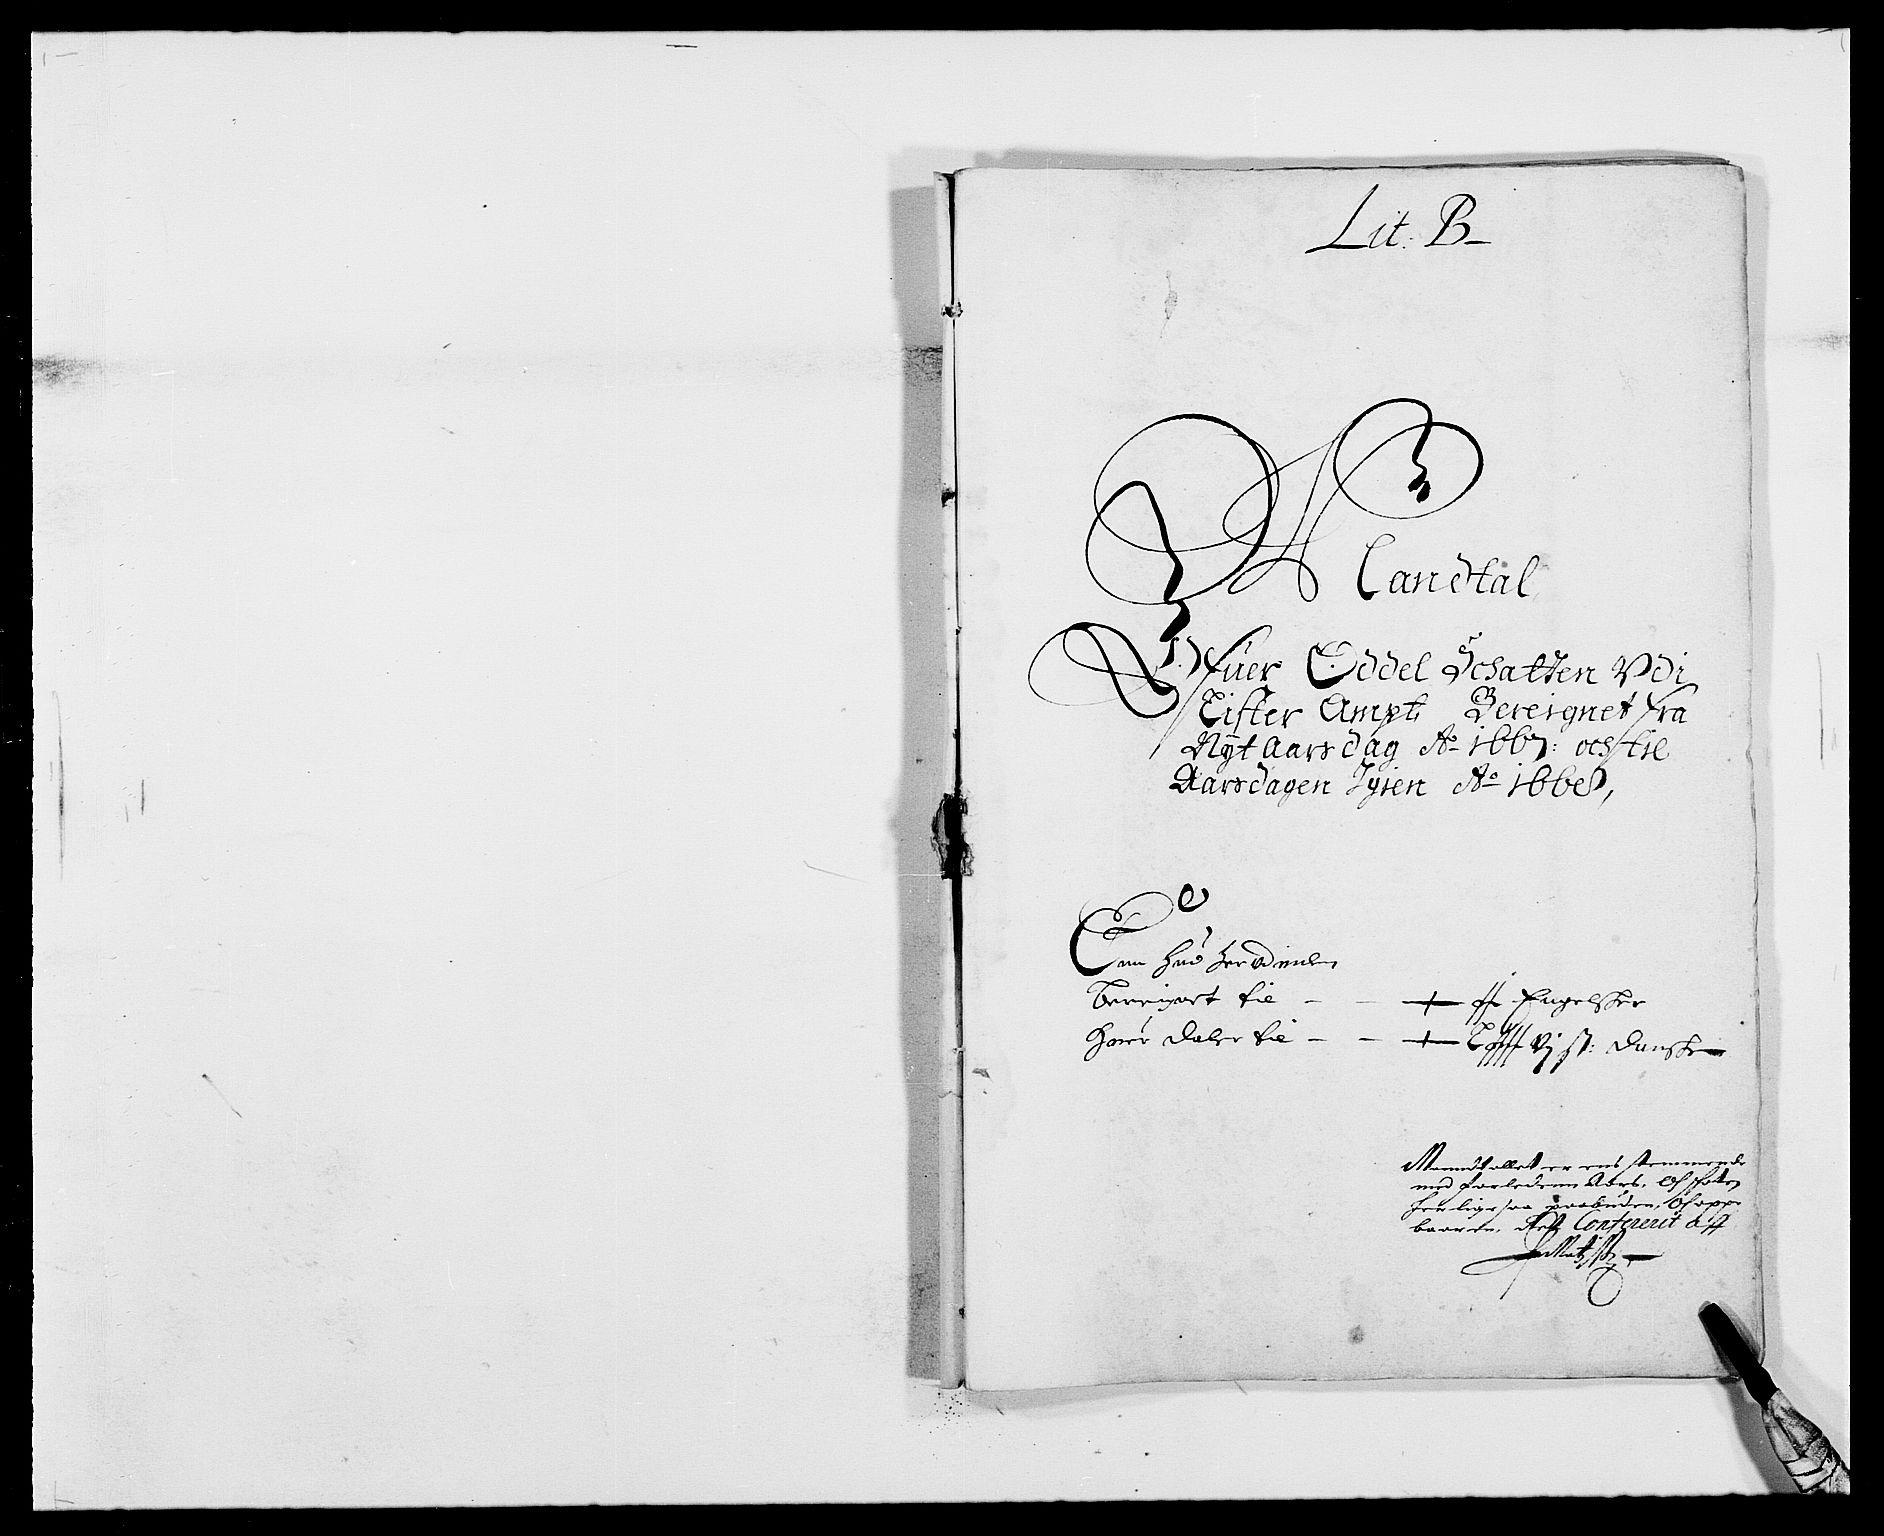 RA, Rentekammeret inntil 1814, Reviderte regnskaper, Fogderegnskap, R41/L2524: Fogderegnskap Lista, 1665-1668, s. 302